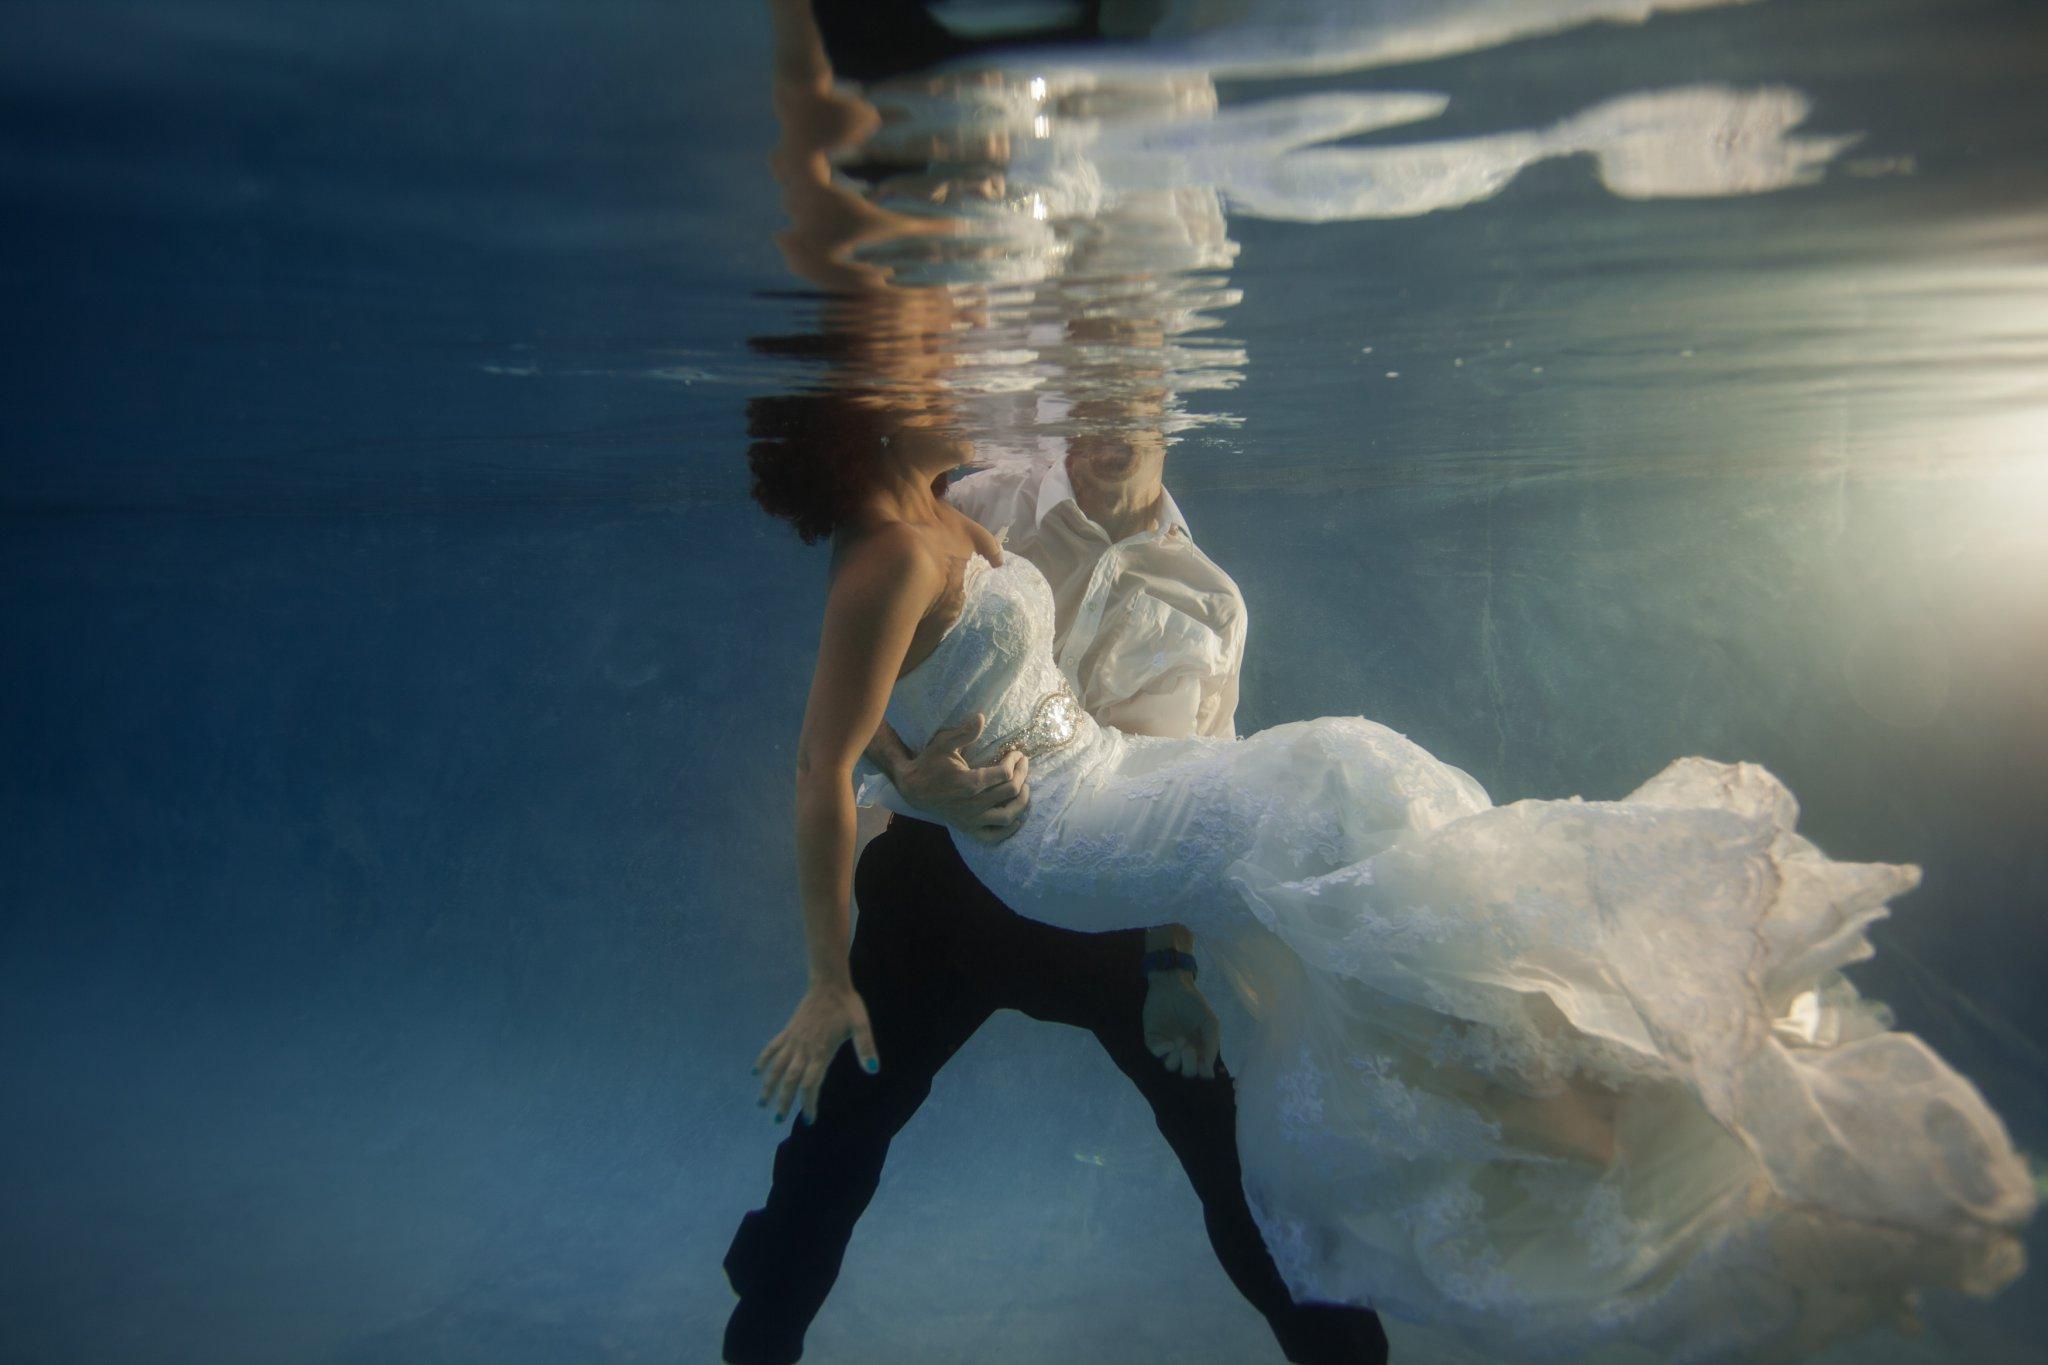 underwater trash the dress photos by Arizona wedding photographer